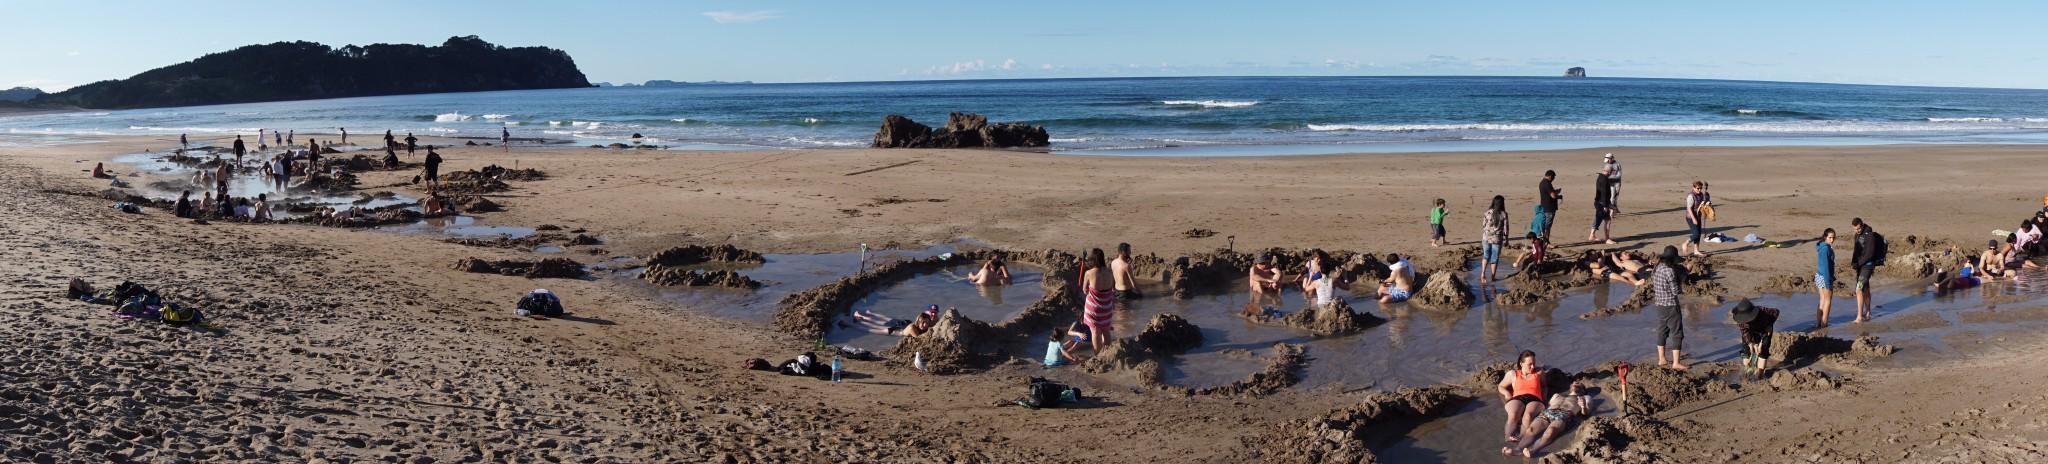 Hot Water Beach post image